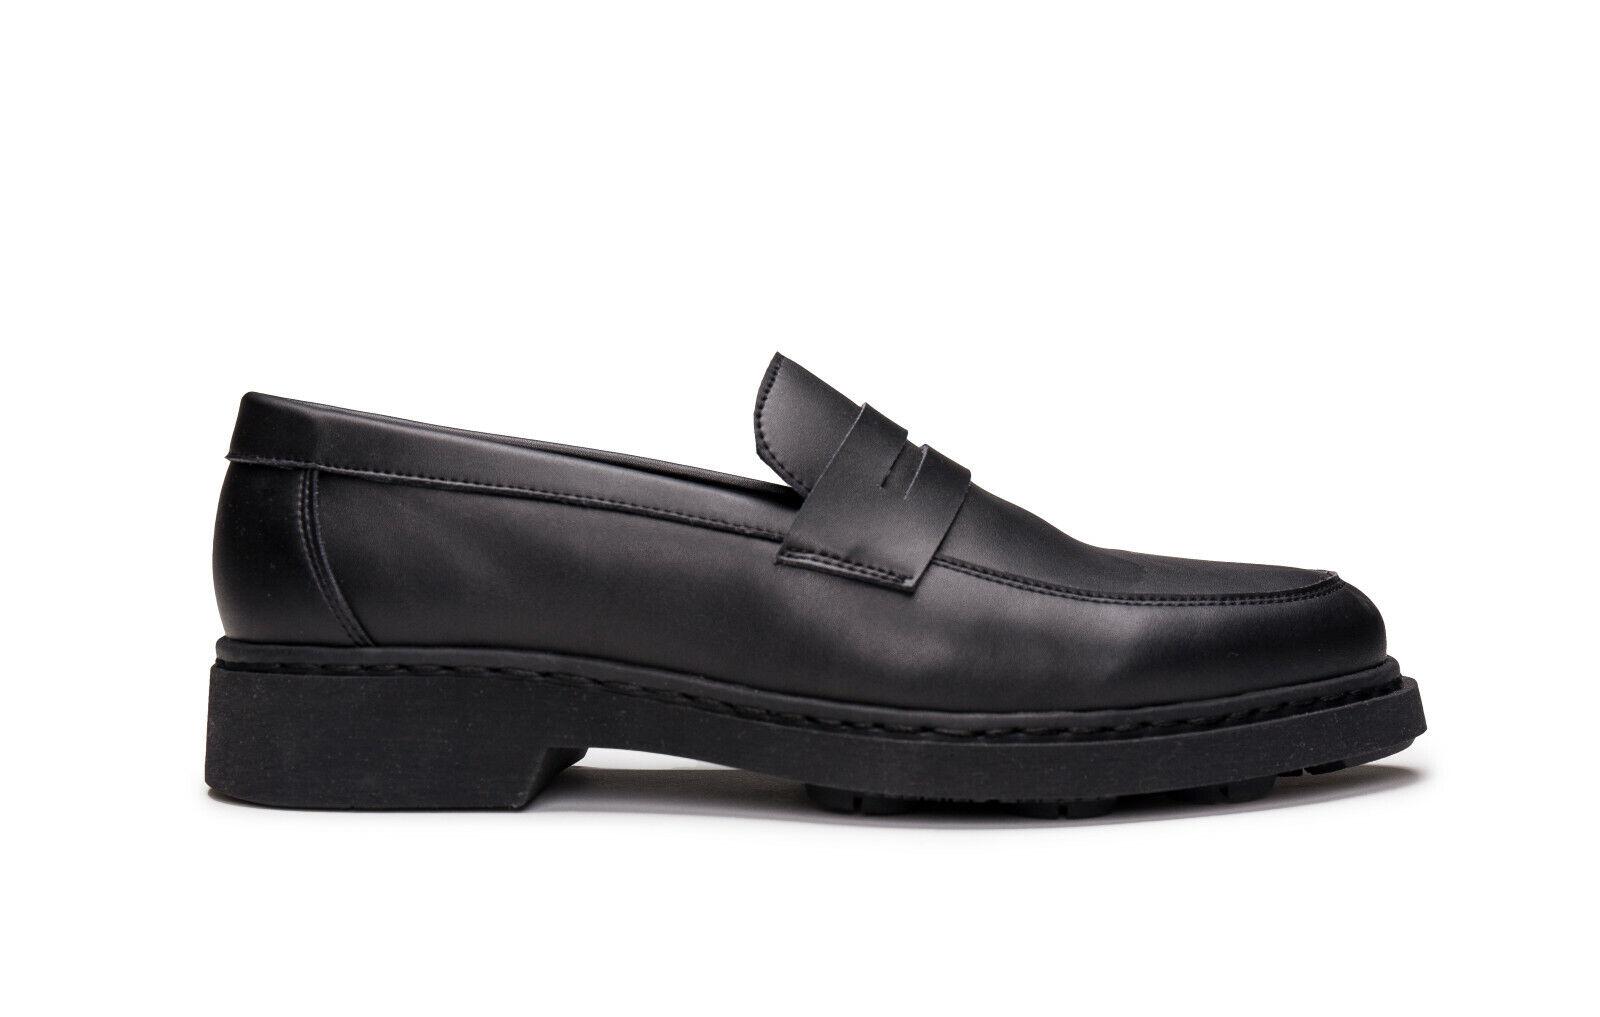 Vegane Schuhe Flach Loafer Mokassin Elegant atmungsaktiv gefüttert Rutschfest